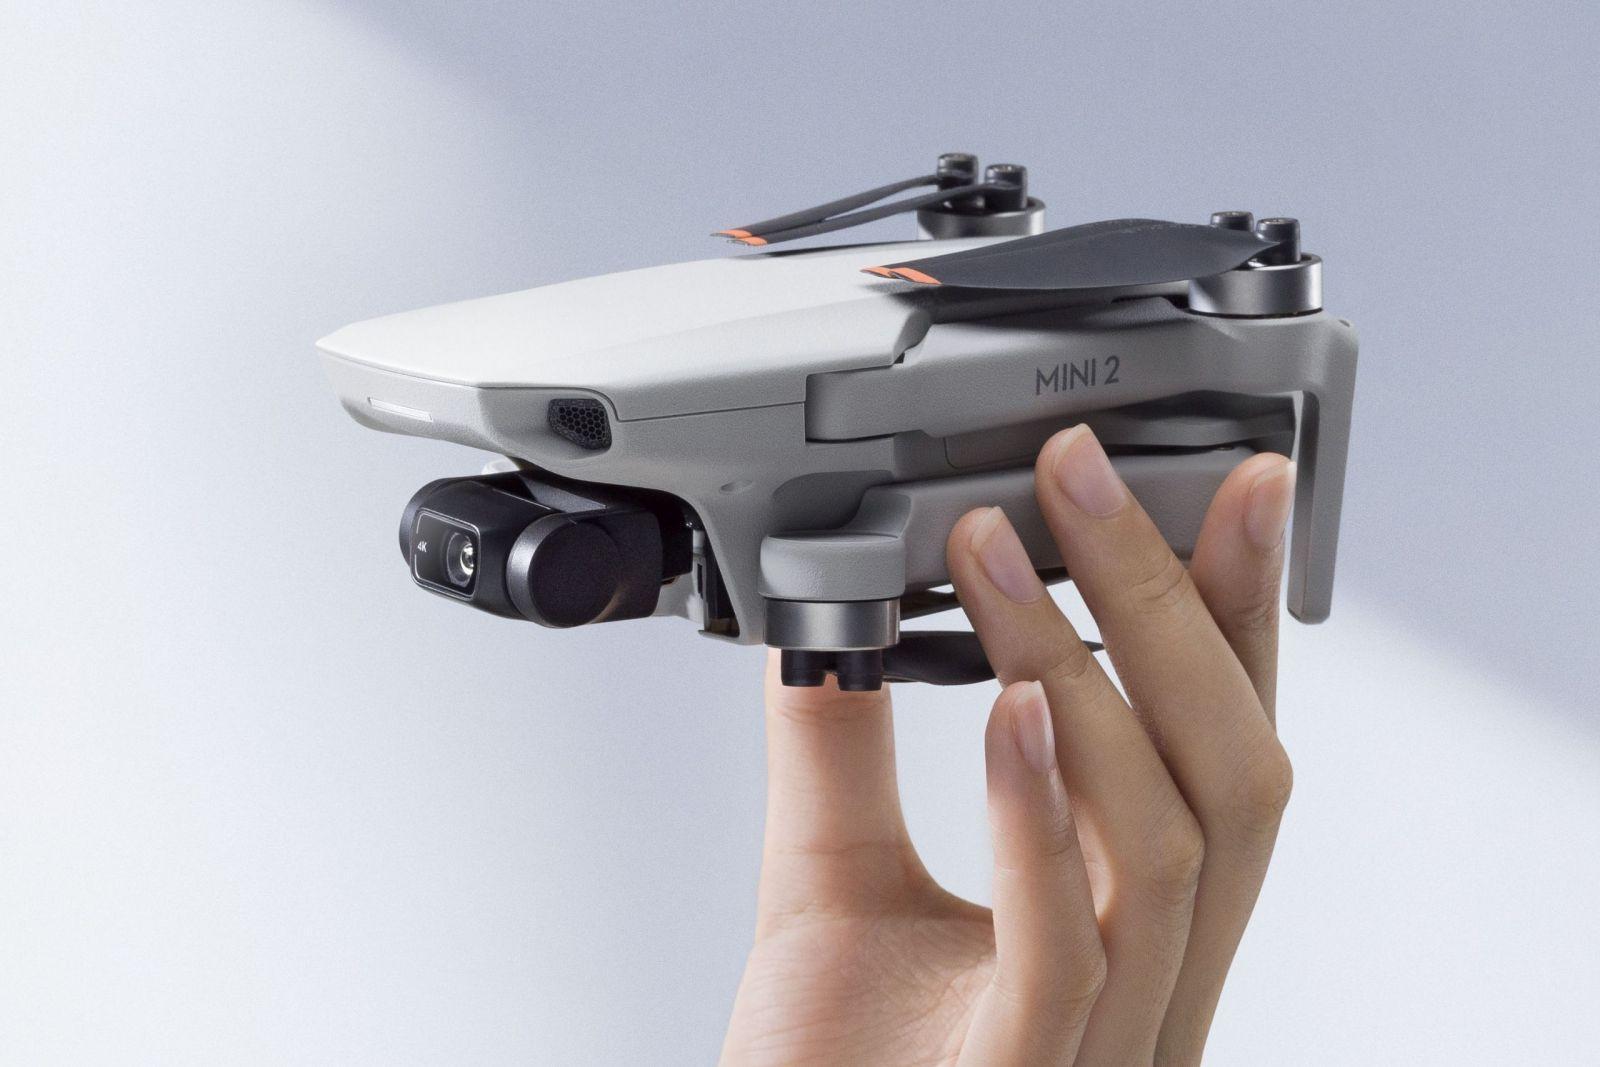 Выпущен дрон DJI Mini 2. Он может снимать 4К-видео (DJI Mini 2 scaled)